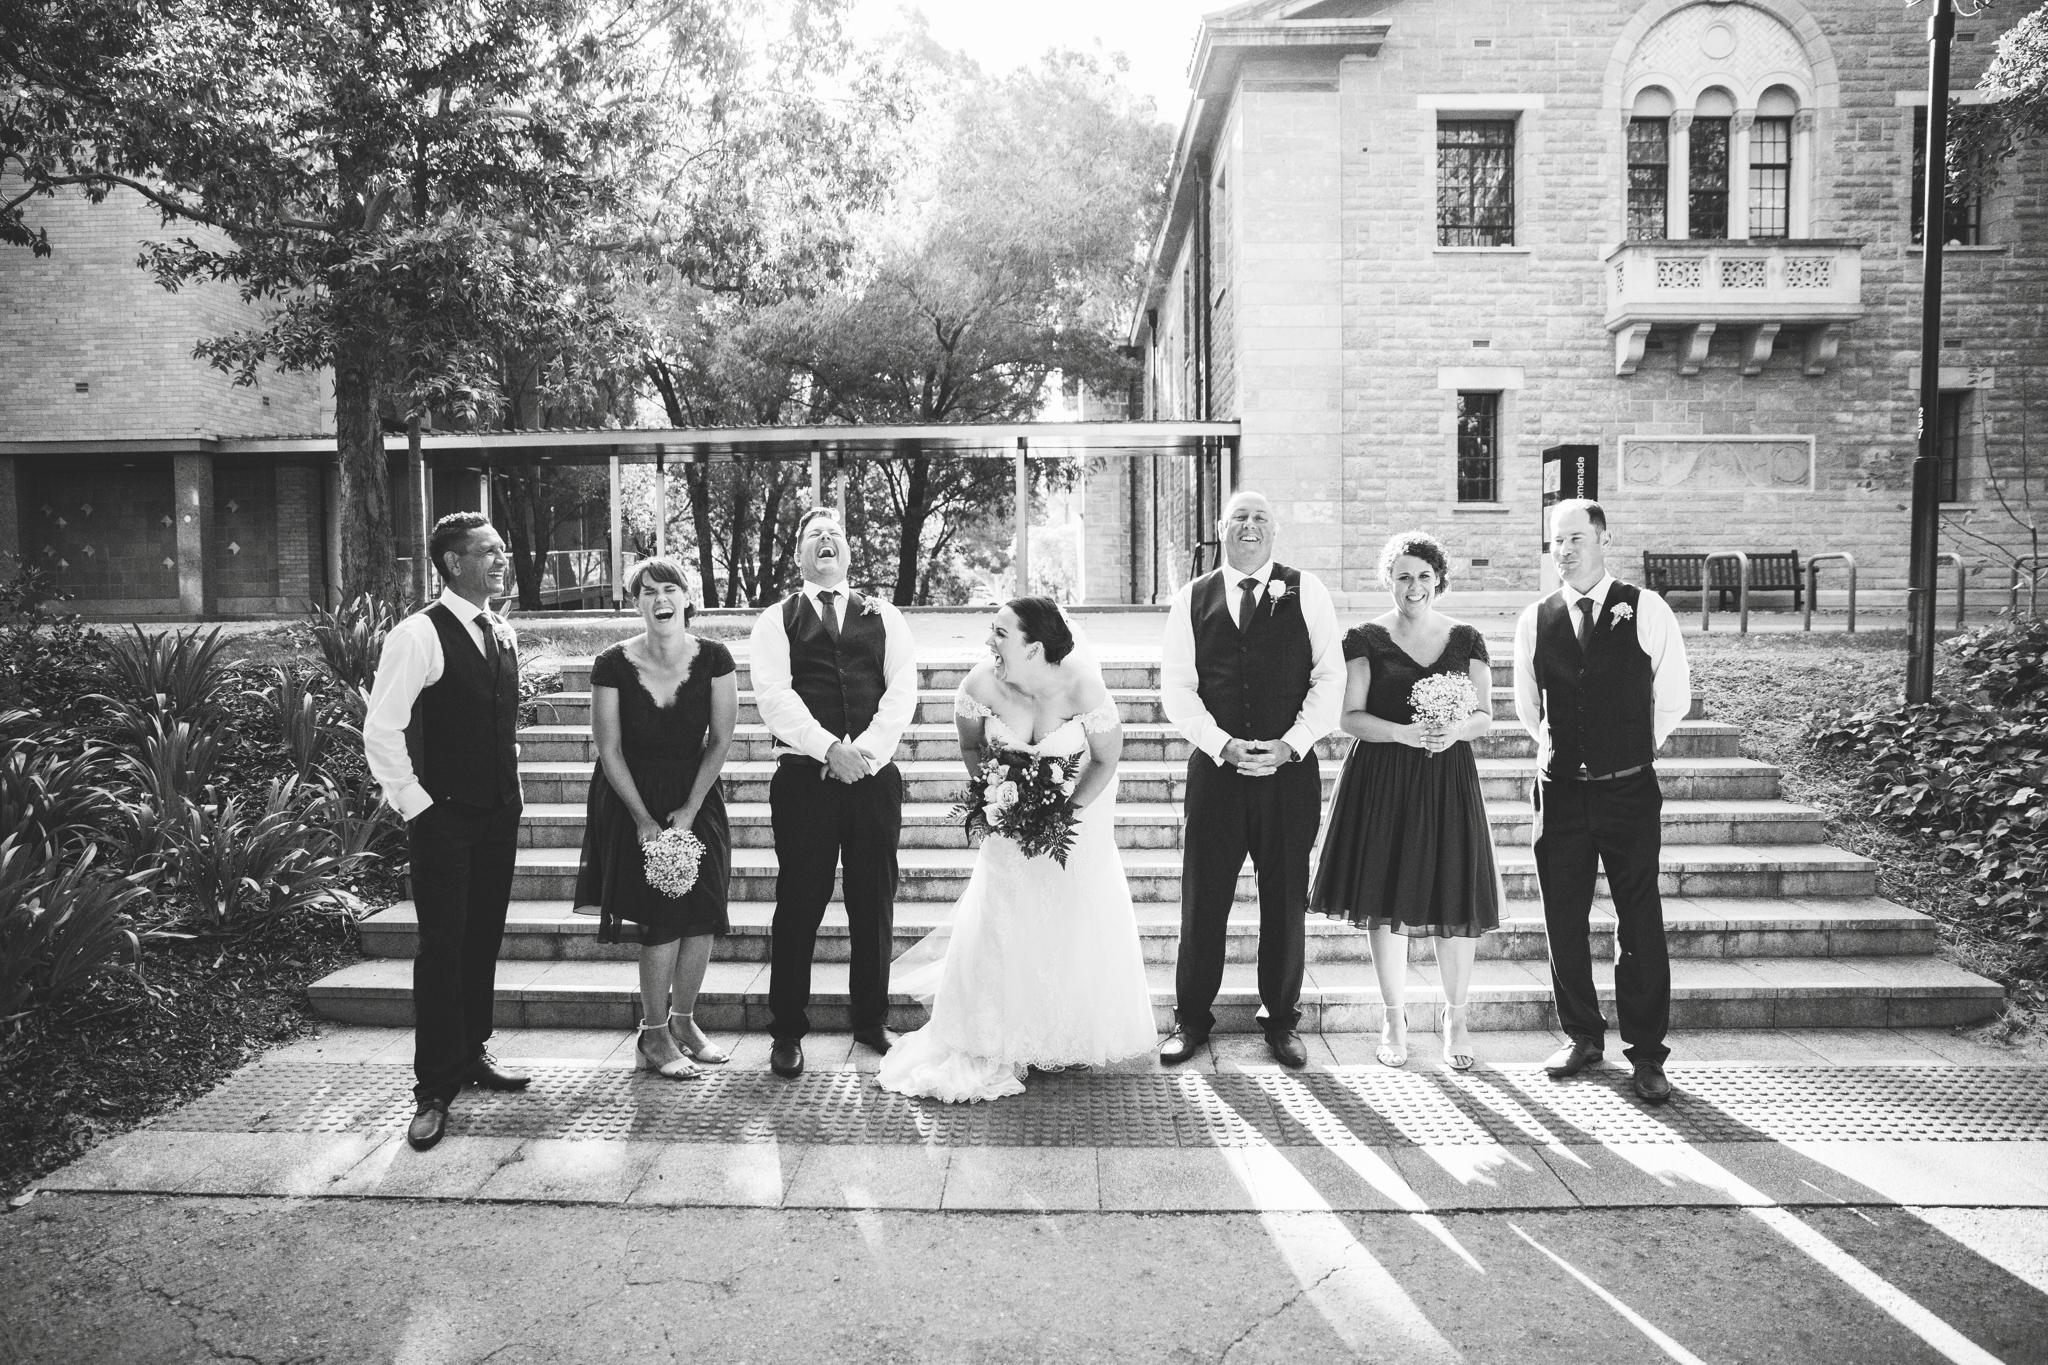 Kyme-steve-wedding-218.jpg